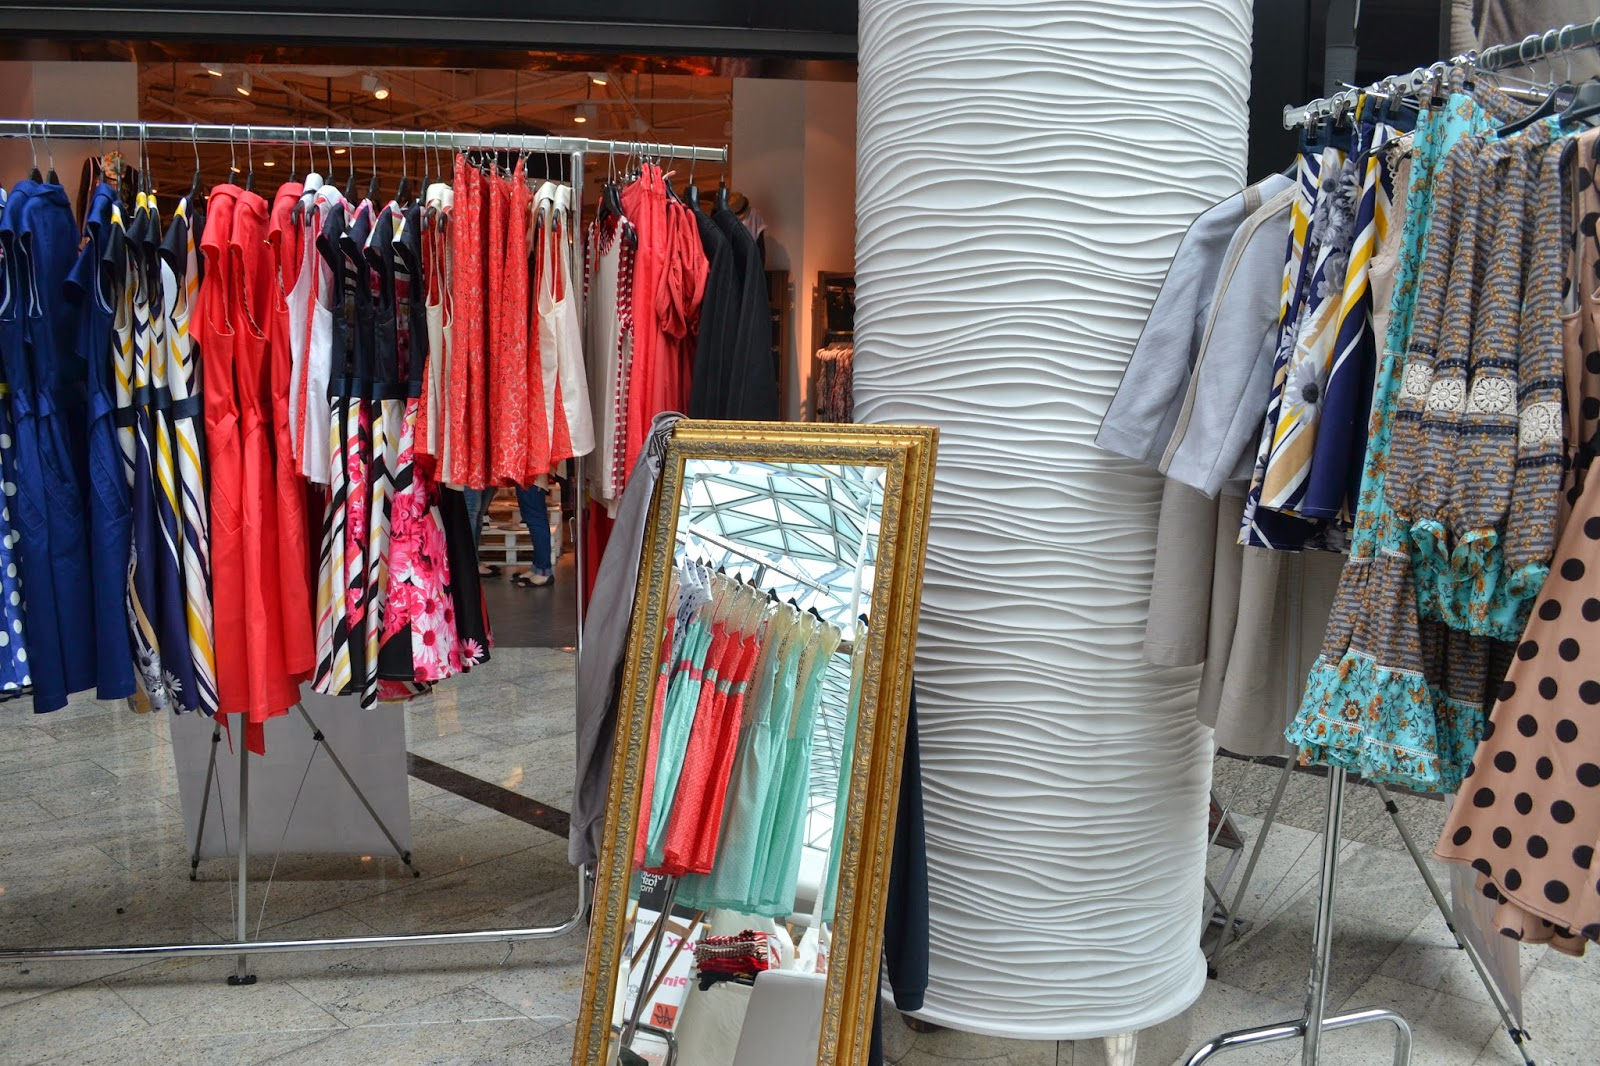 Sirocco fashion market larnaca 1969 plymouth fury iii eBay